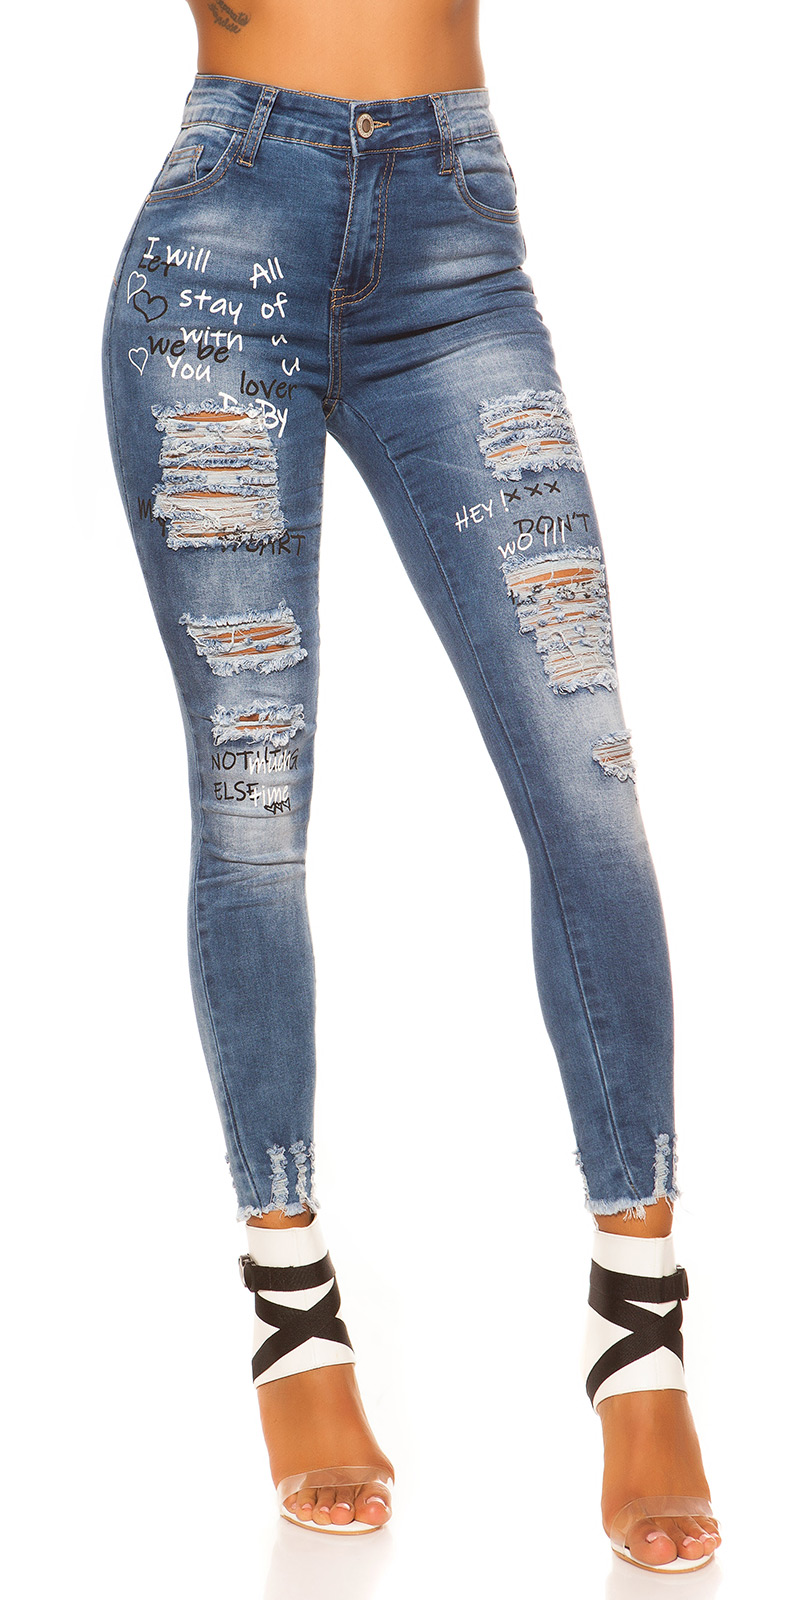 Trendstylez - Damen Used Röhren Skinny Jeans Schriftprint